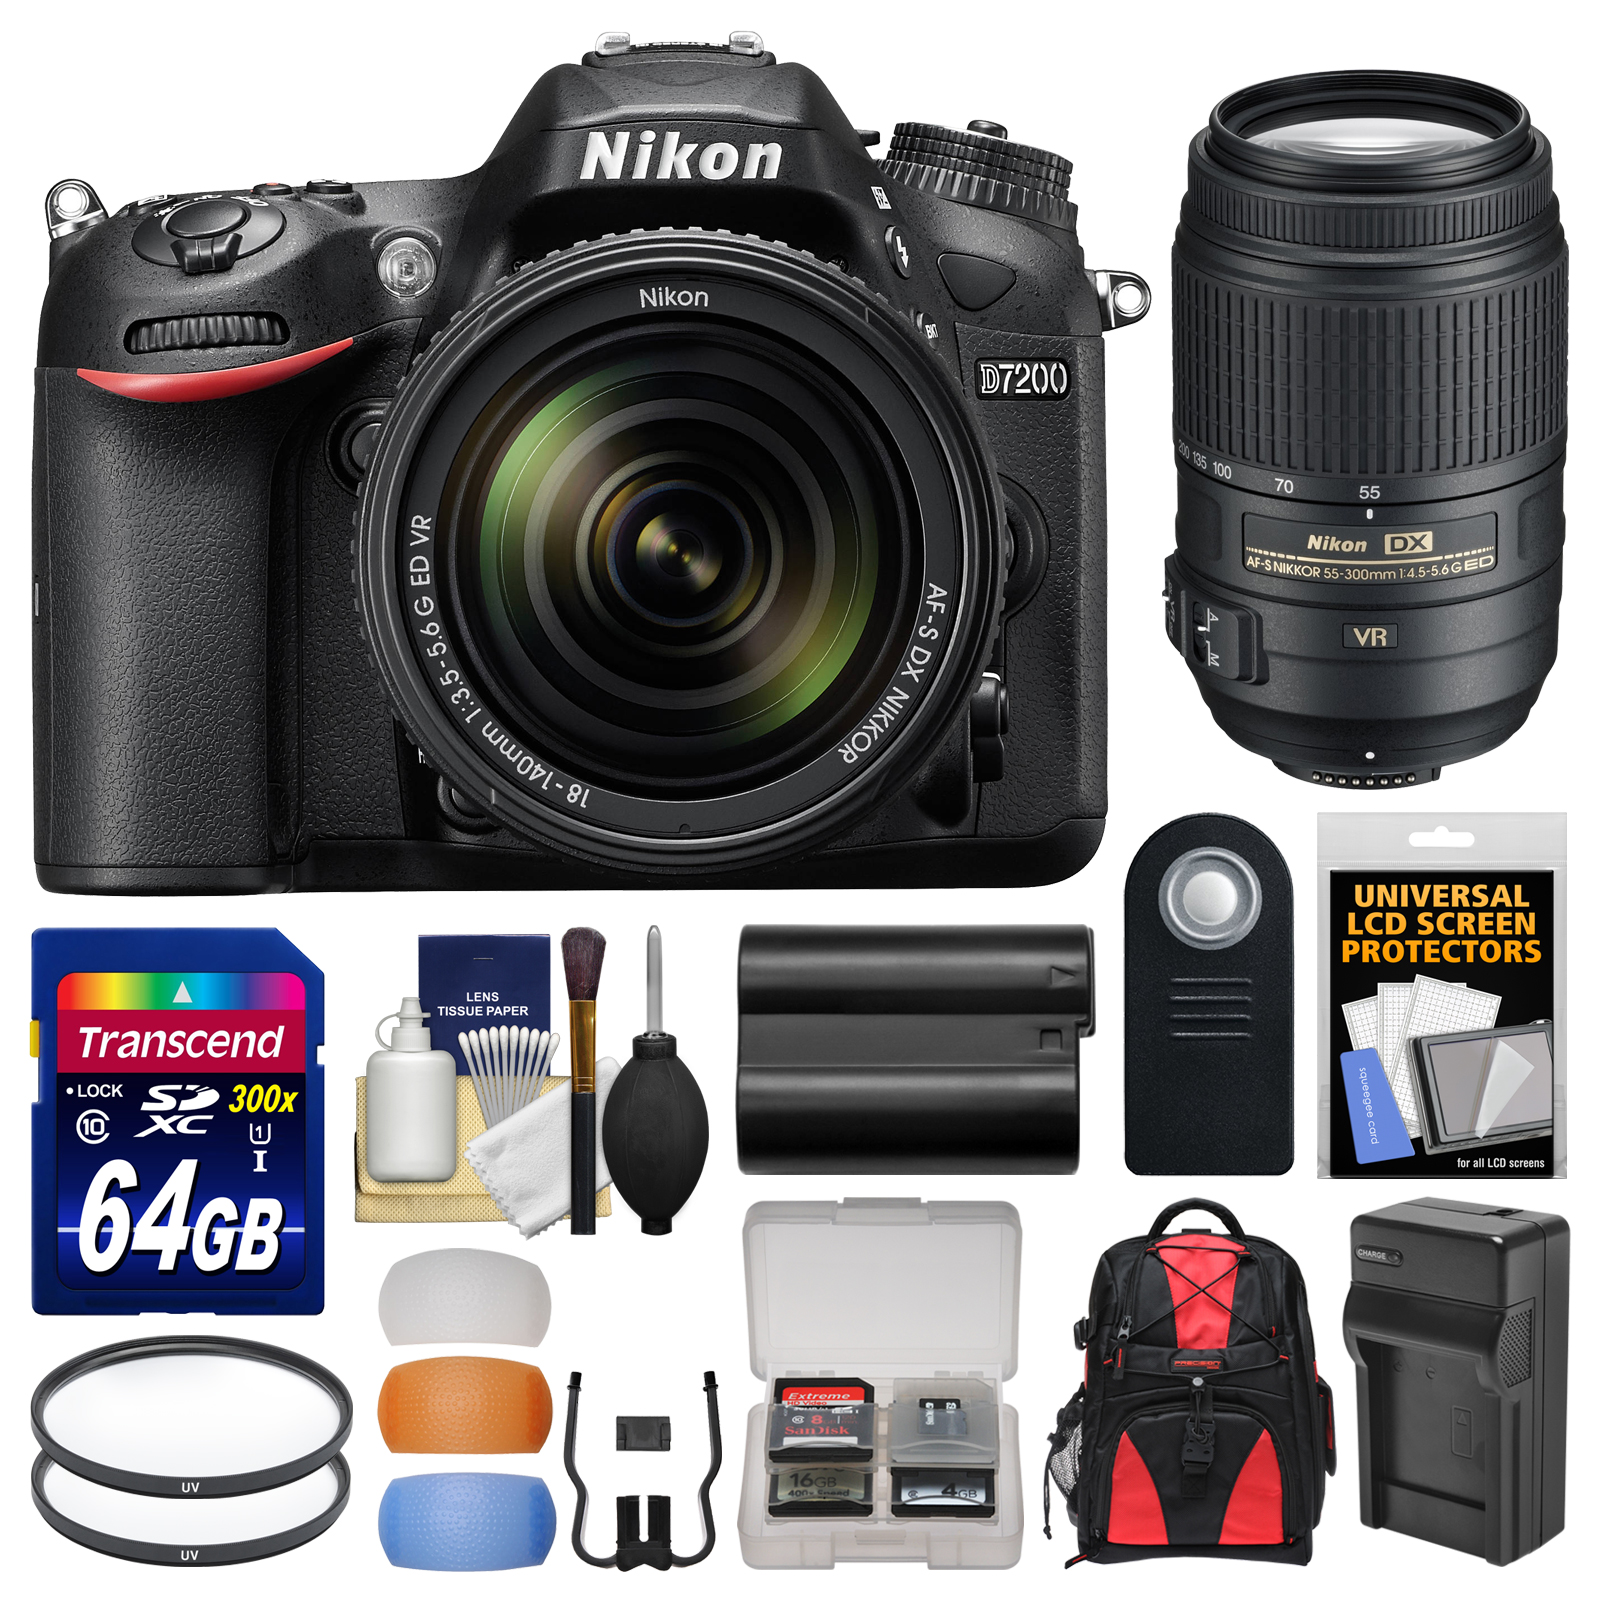 Nikon D7200 Wi-Fi Digital SLR Camera & 18-140mm VR DX & 55-300mm VR Lens with 64GB Card + Backpack + Battery... by Nikon